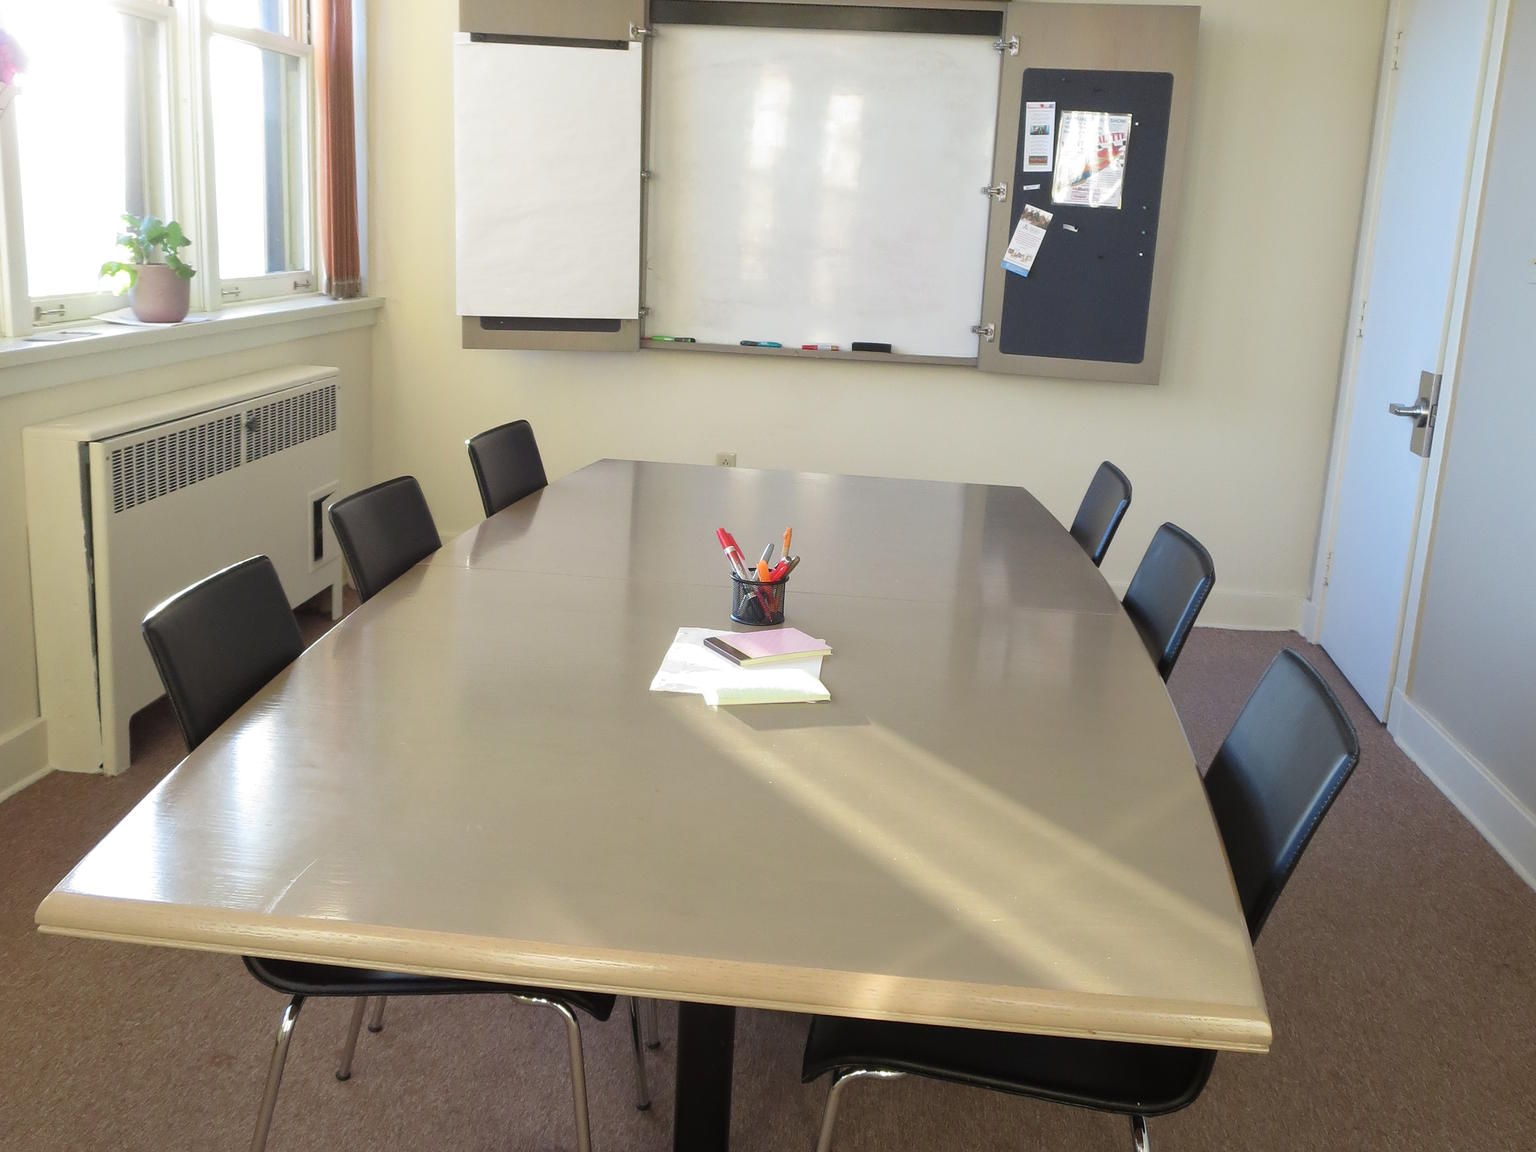 class_room_2